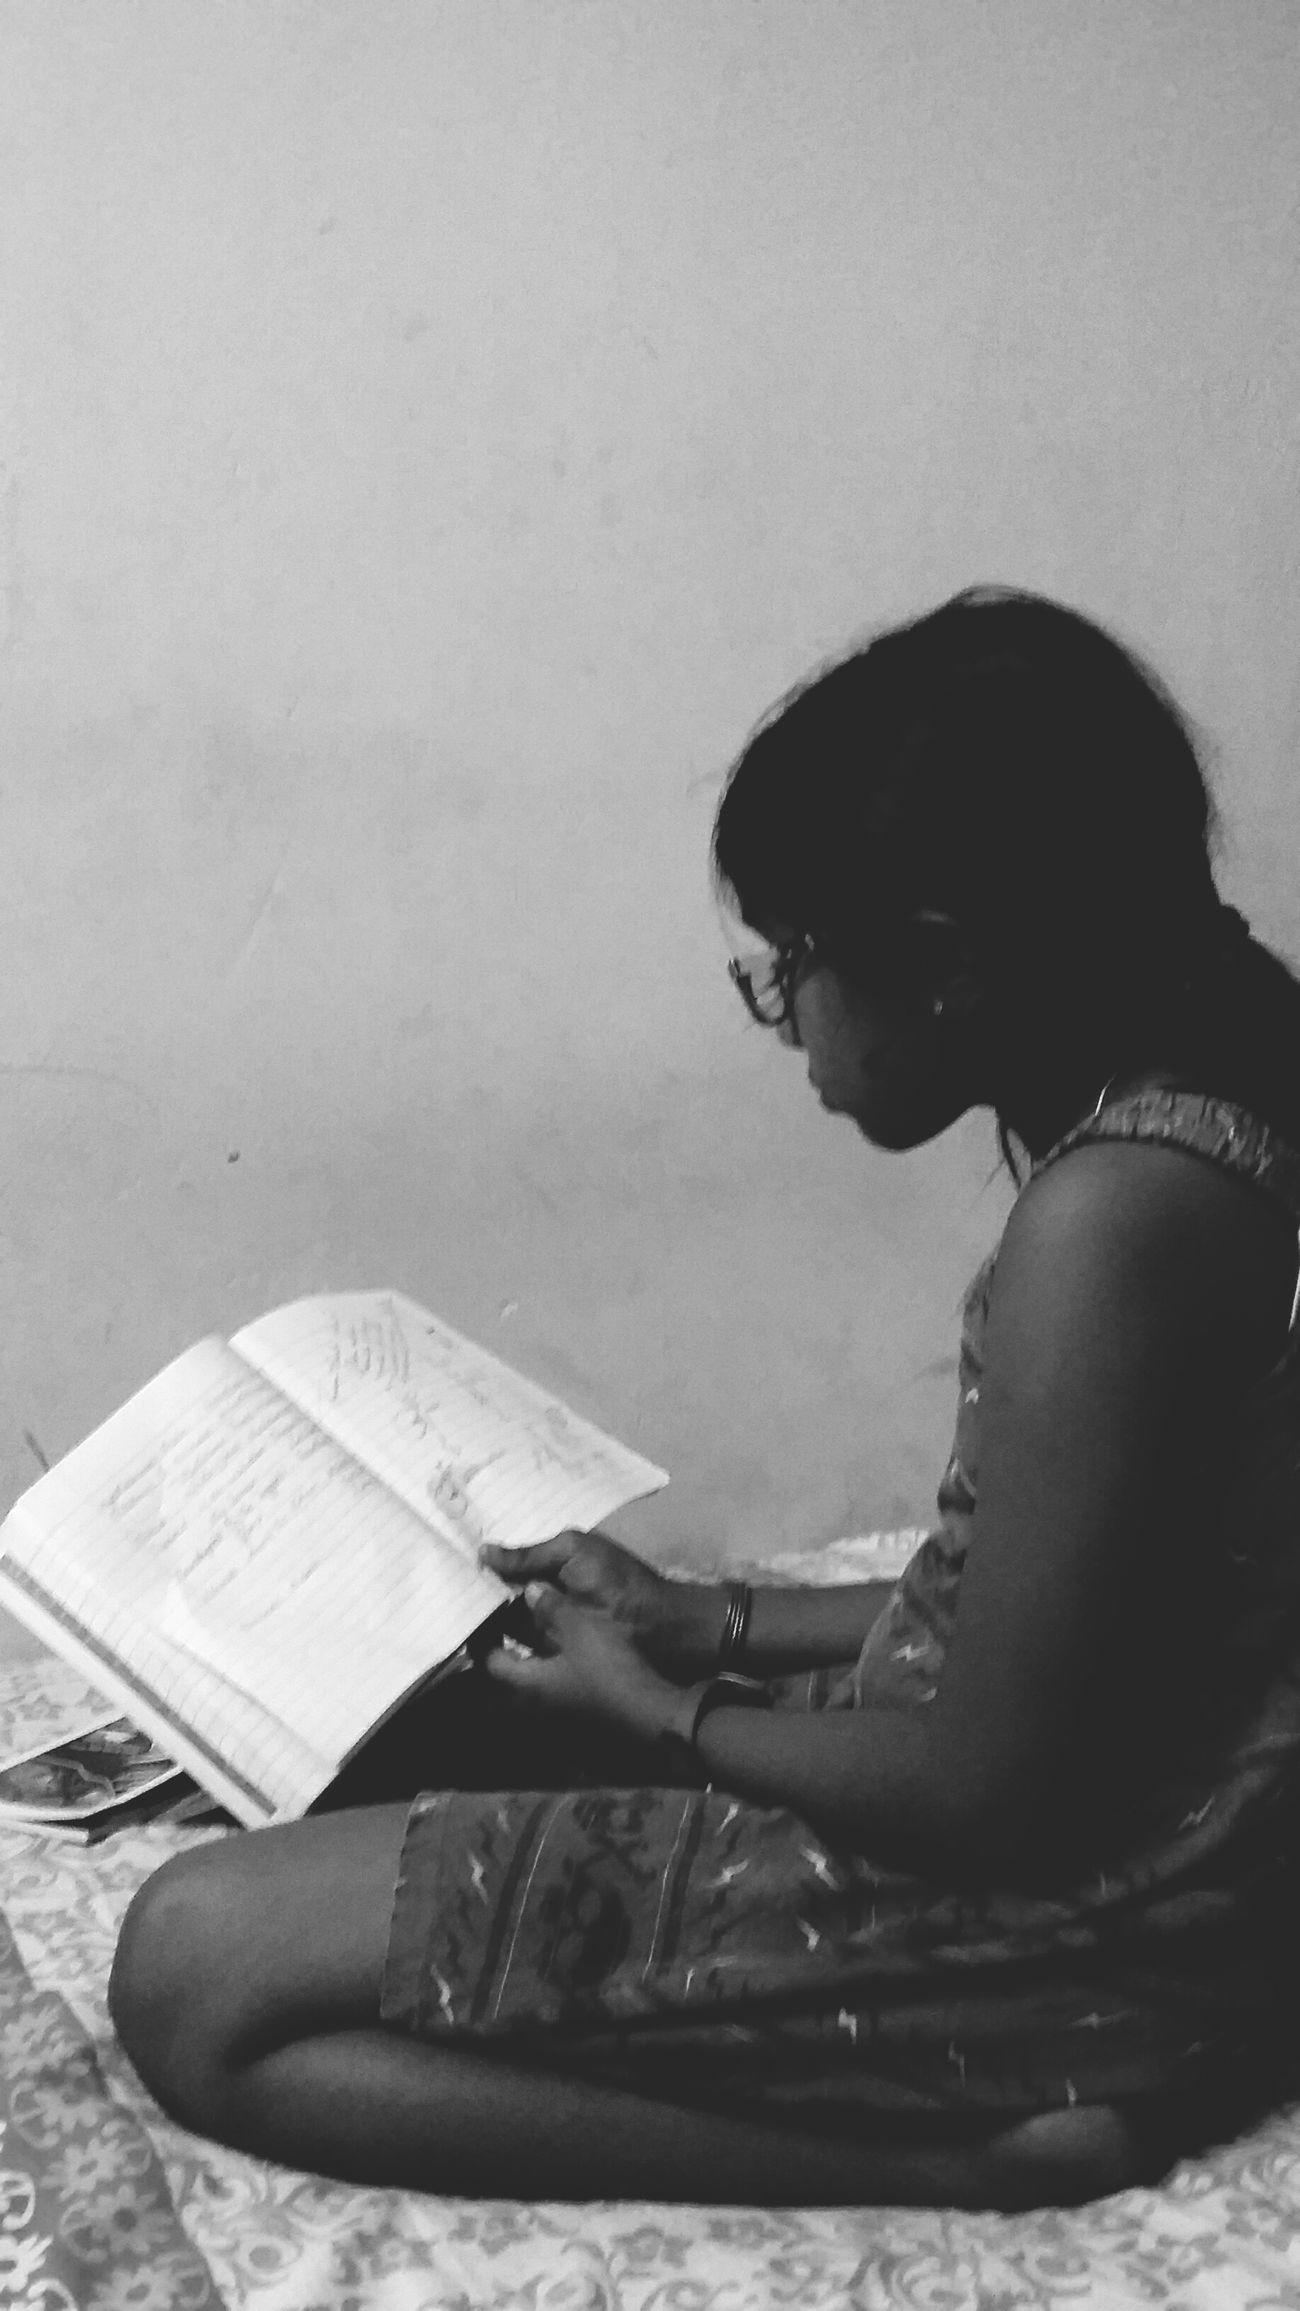 My Student Life Sis❤ Studying Hard Exams Blackandwhite Photography